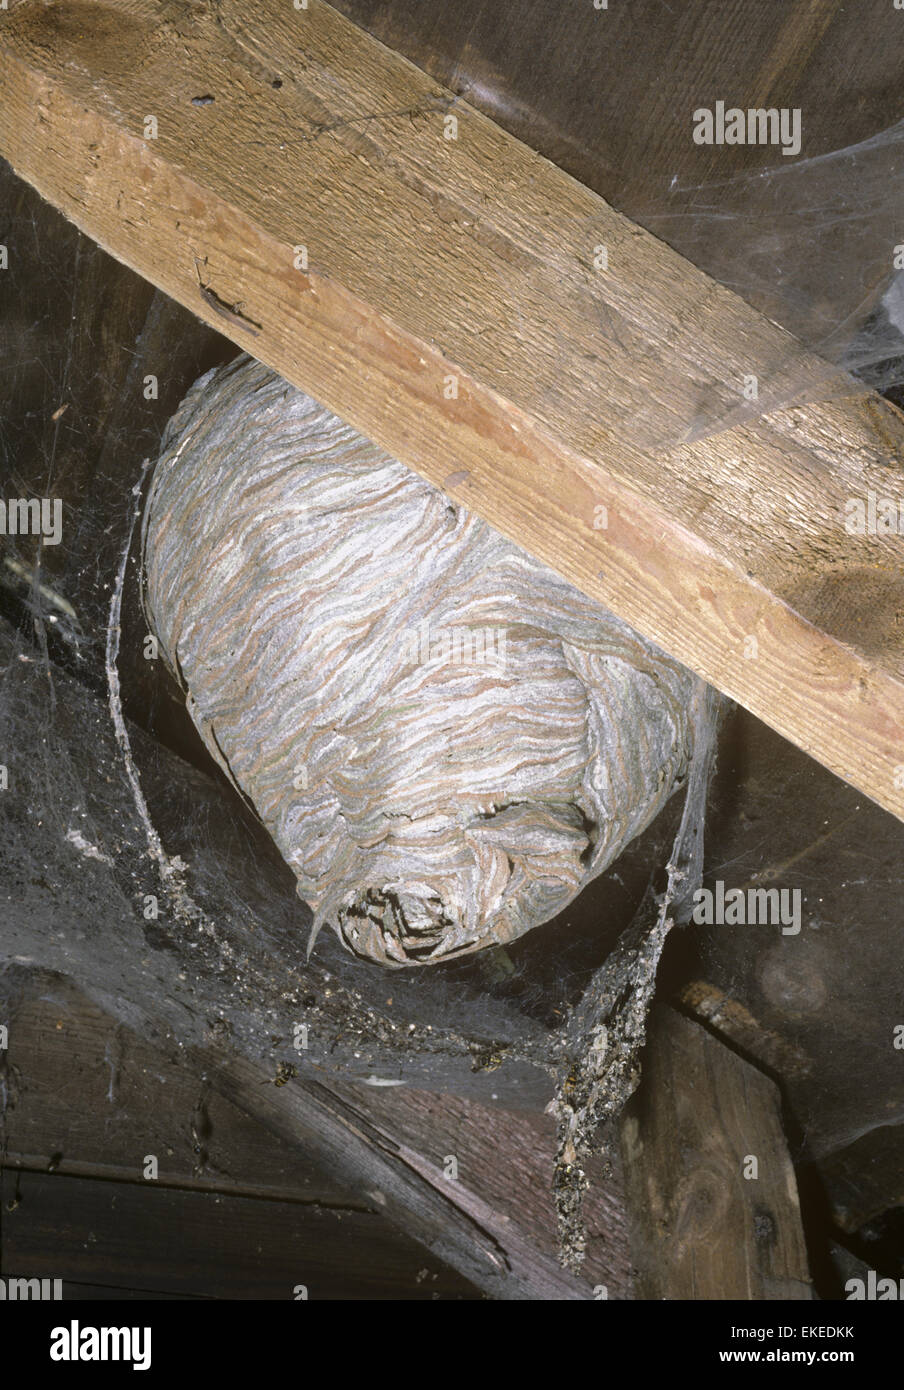 Common Wasp Nest - Vespa vulgaris - Stock Image